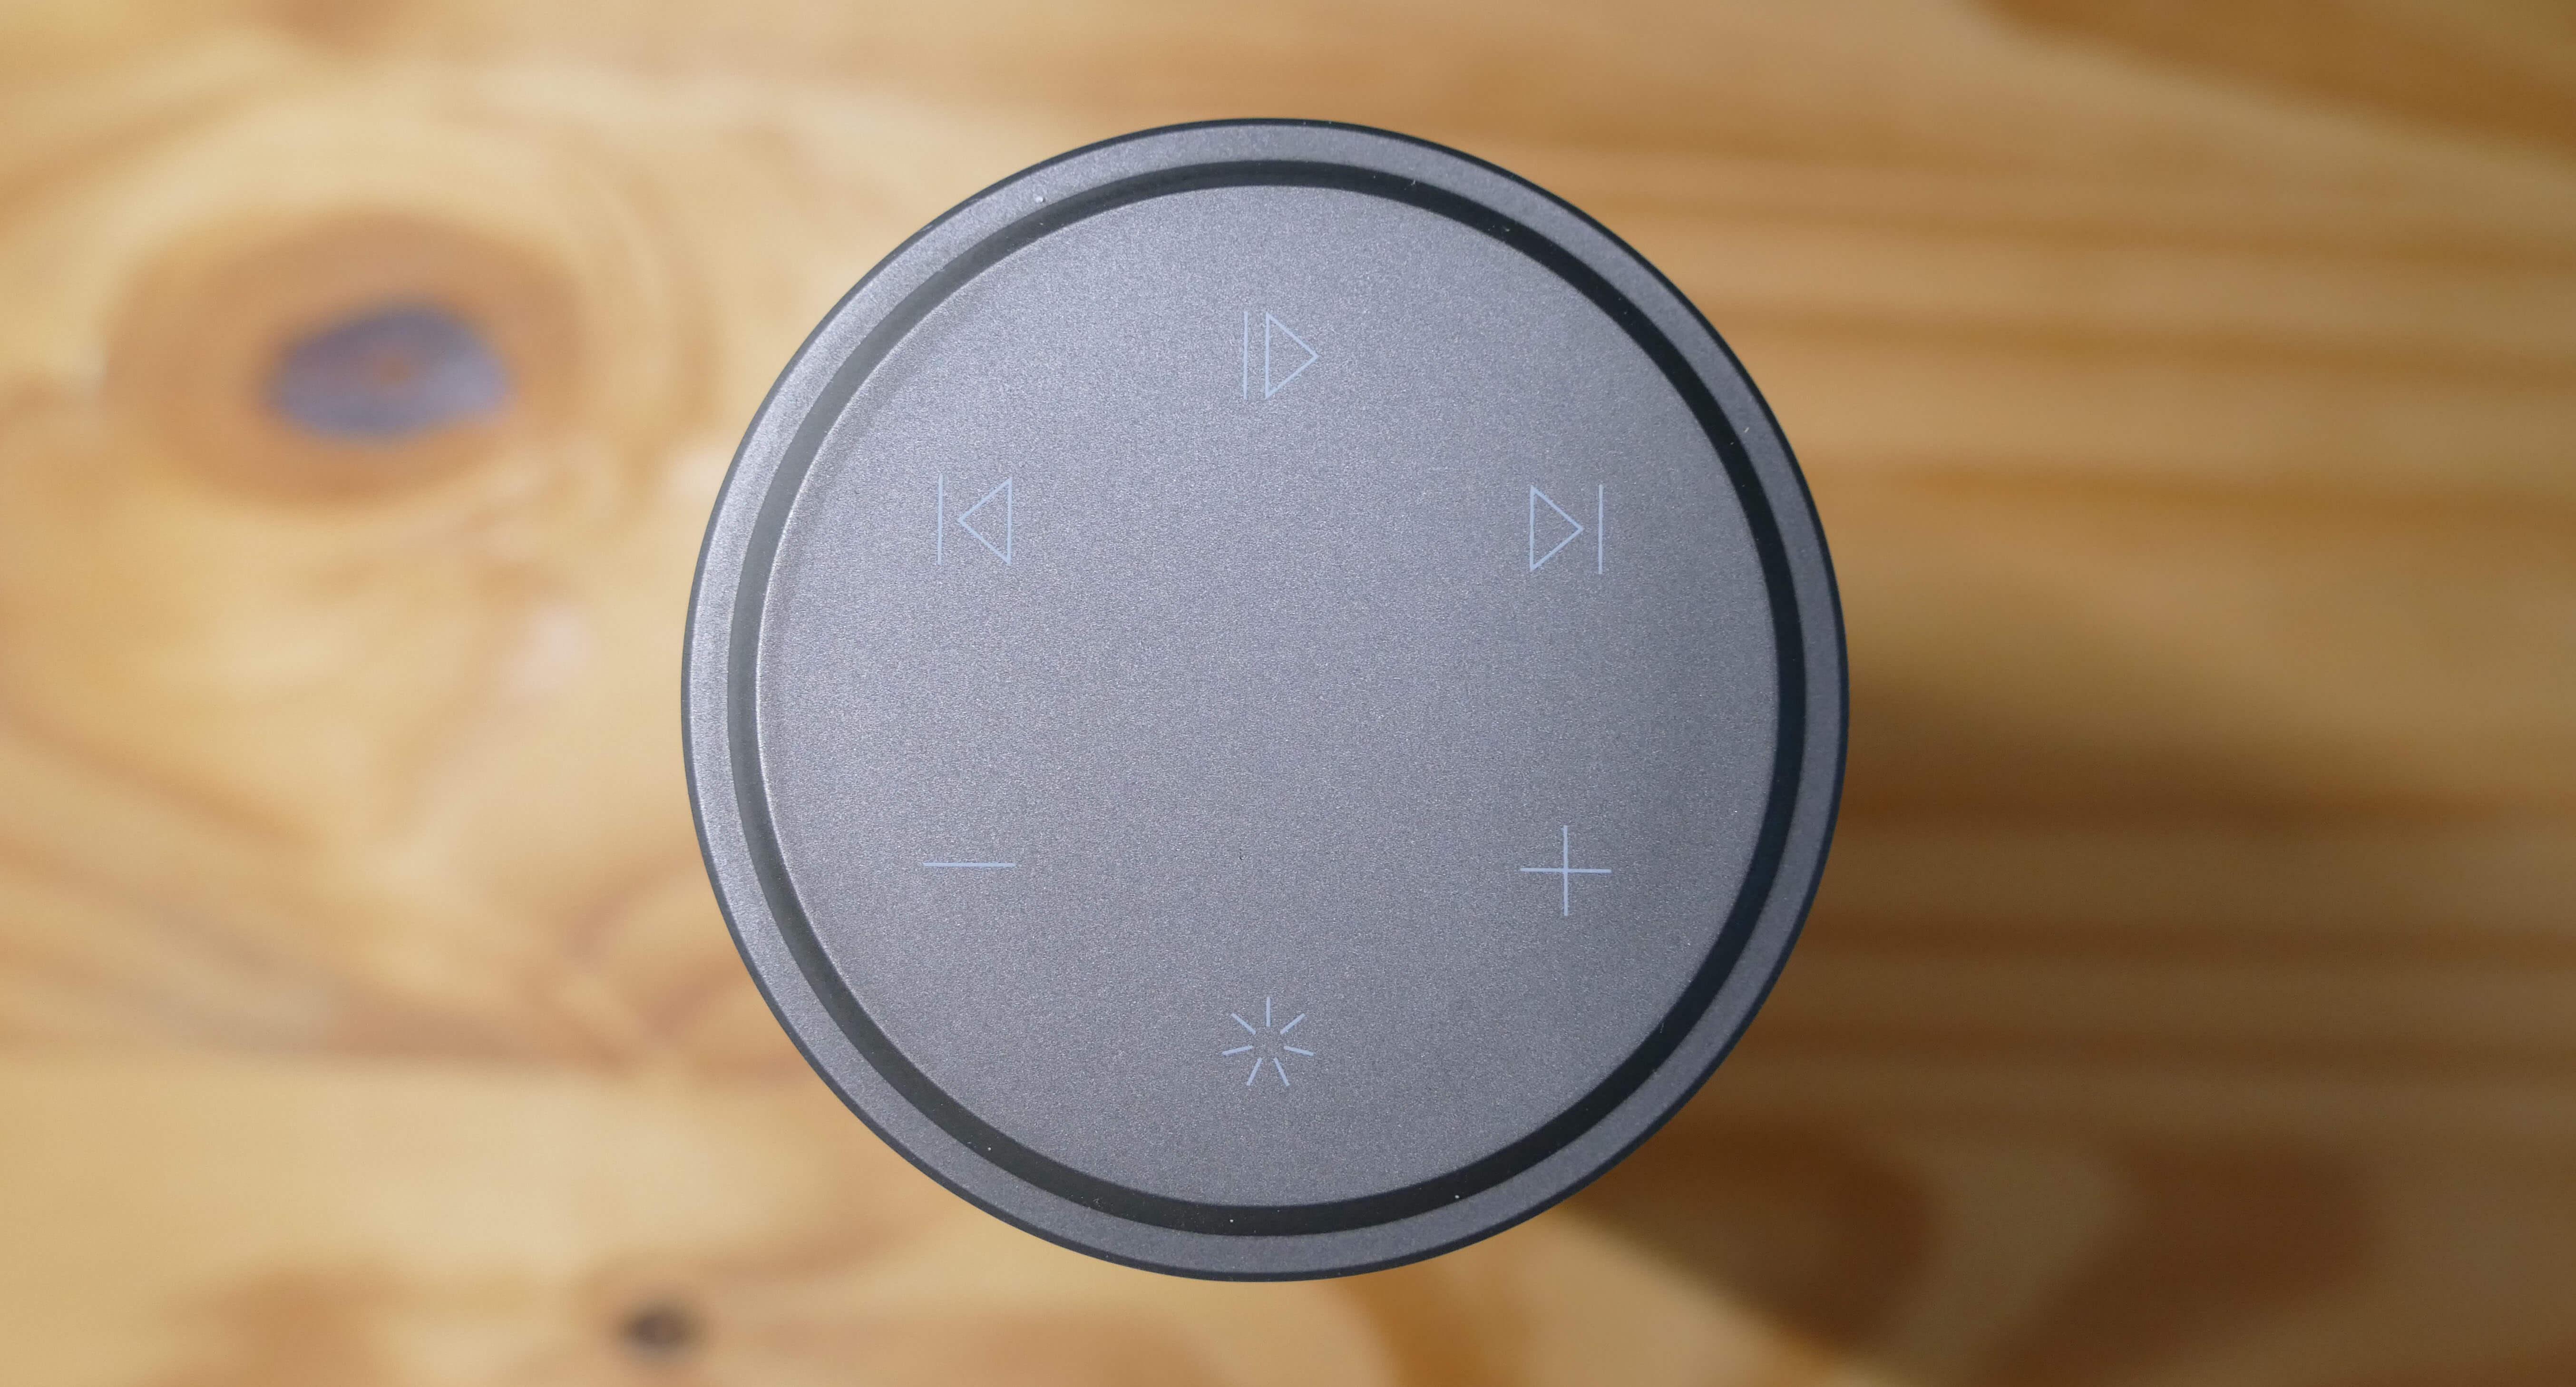 touchesenceinte portable bluetooth oittm test review fr warmix